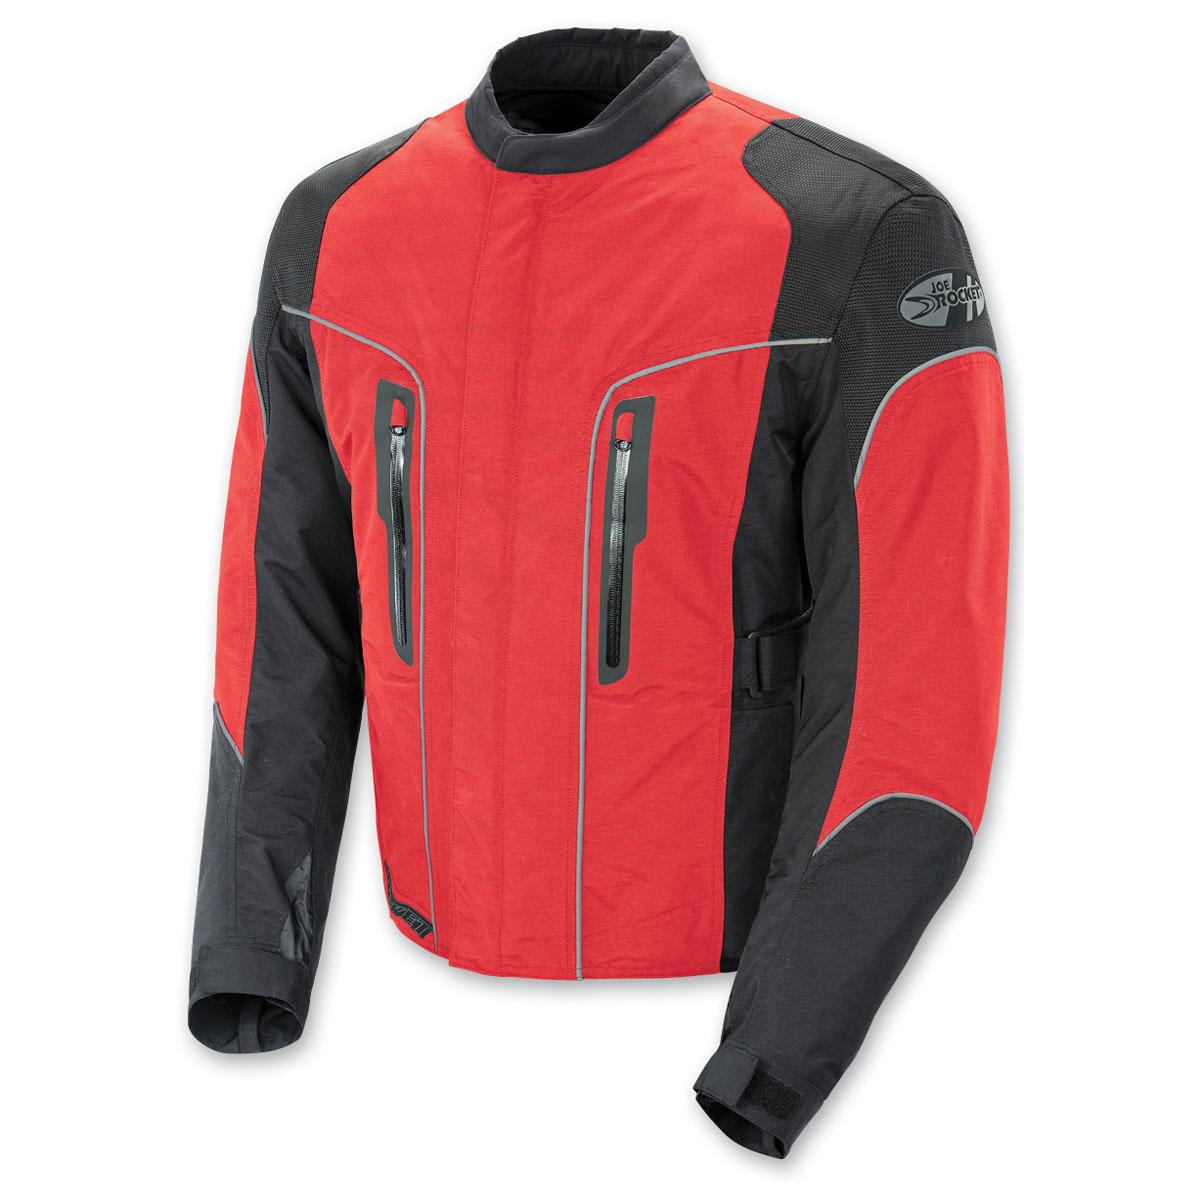 Joe Rocket Men's Alter Ego 3.0 Mesh Red Jacket